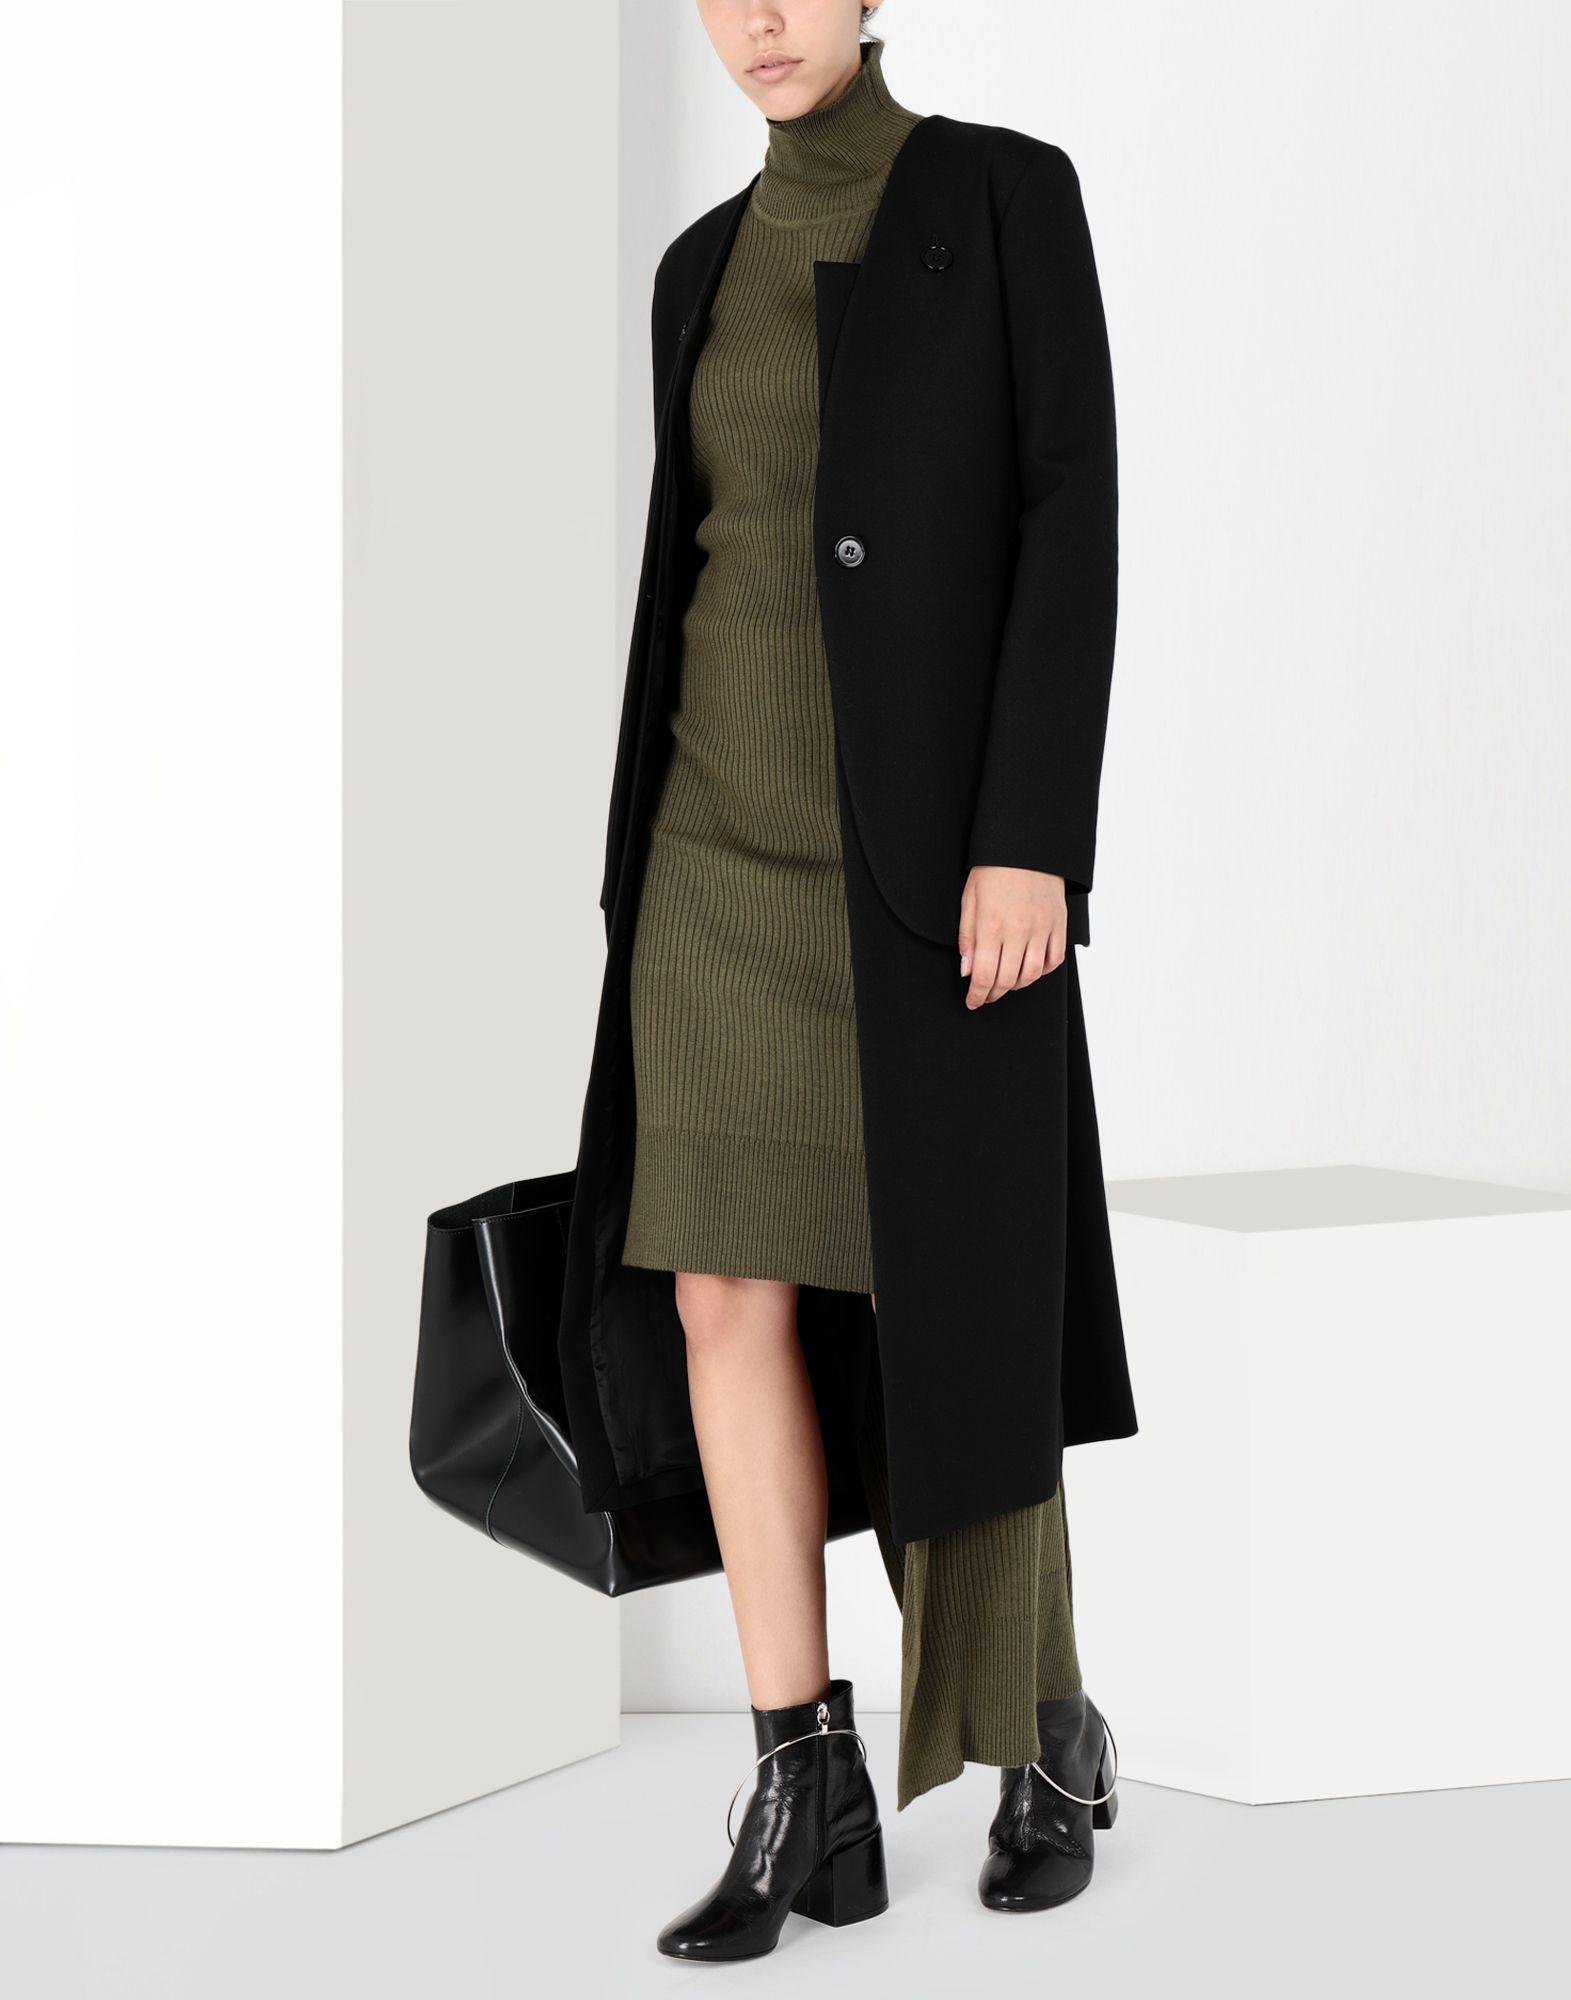 MM6 MAISON MARGIELA Knitwear polo neck dress Long dress Woman r